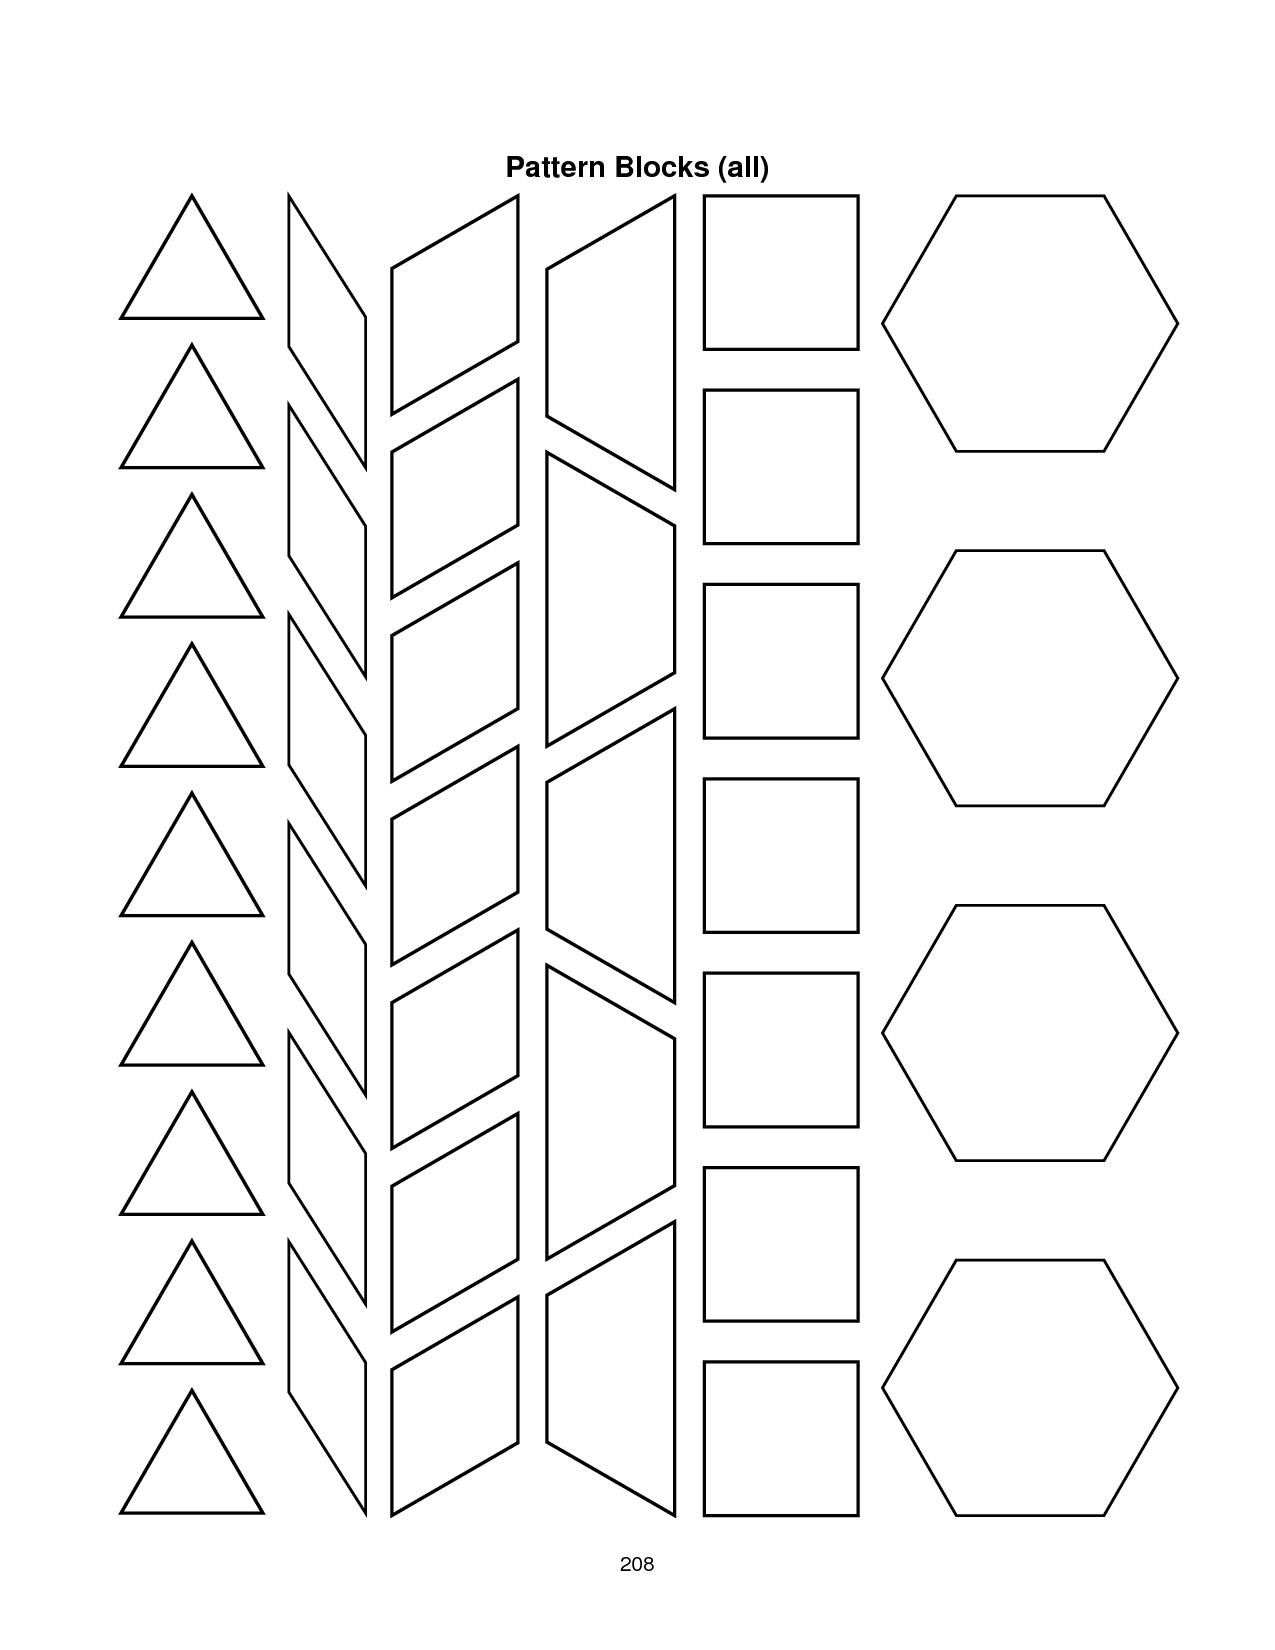 28 Images Of Blank Alphabet Pattern Block Template | Migapps For Blank Pattern Block Templates